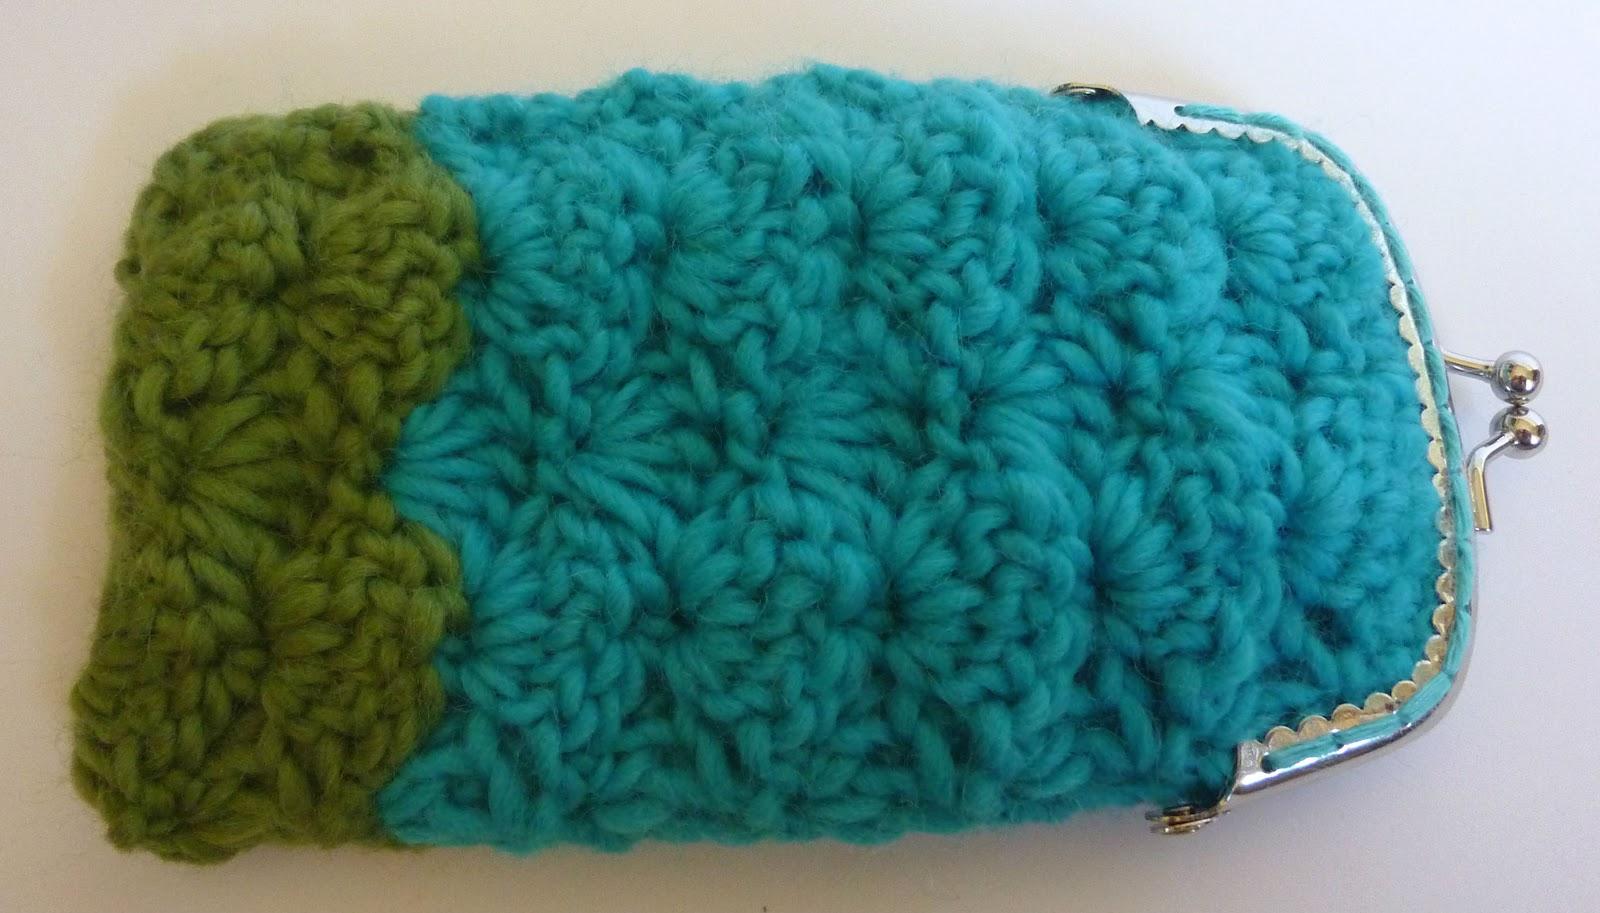 Crochet dynamite purse frame project purse frame project bankloansurffo Images